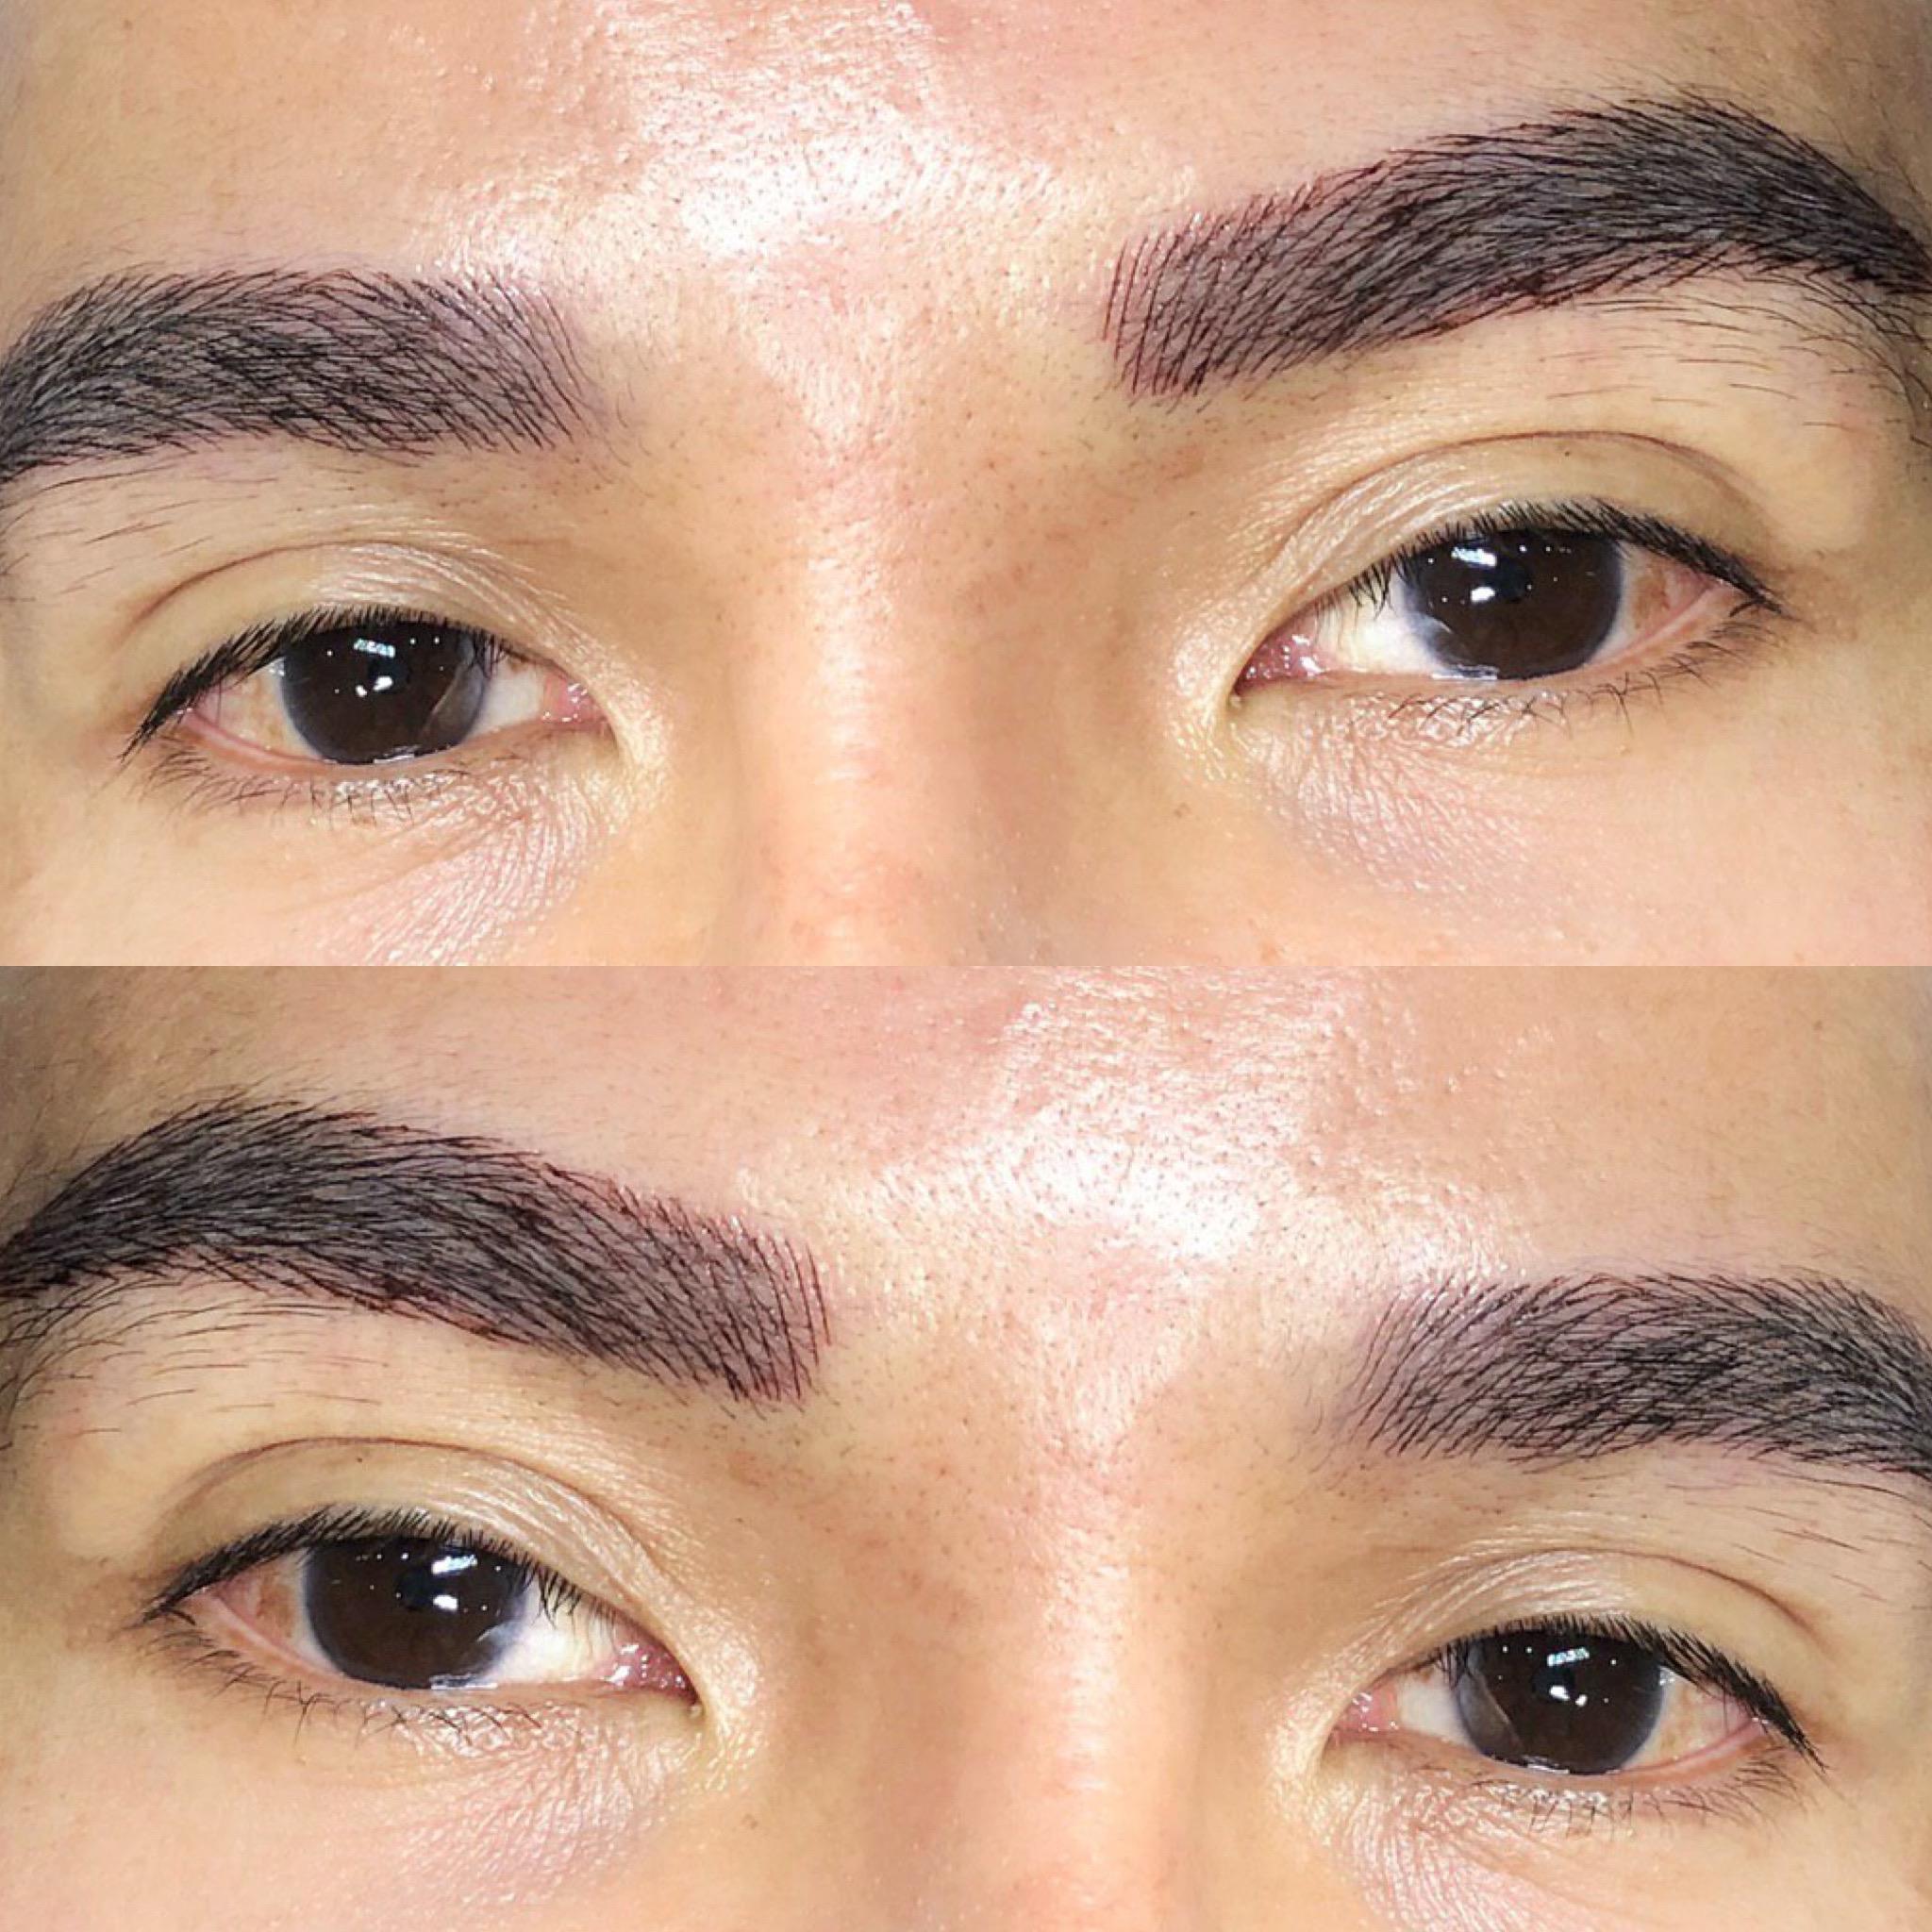 men eyebrow embroidery 2